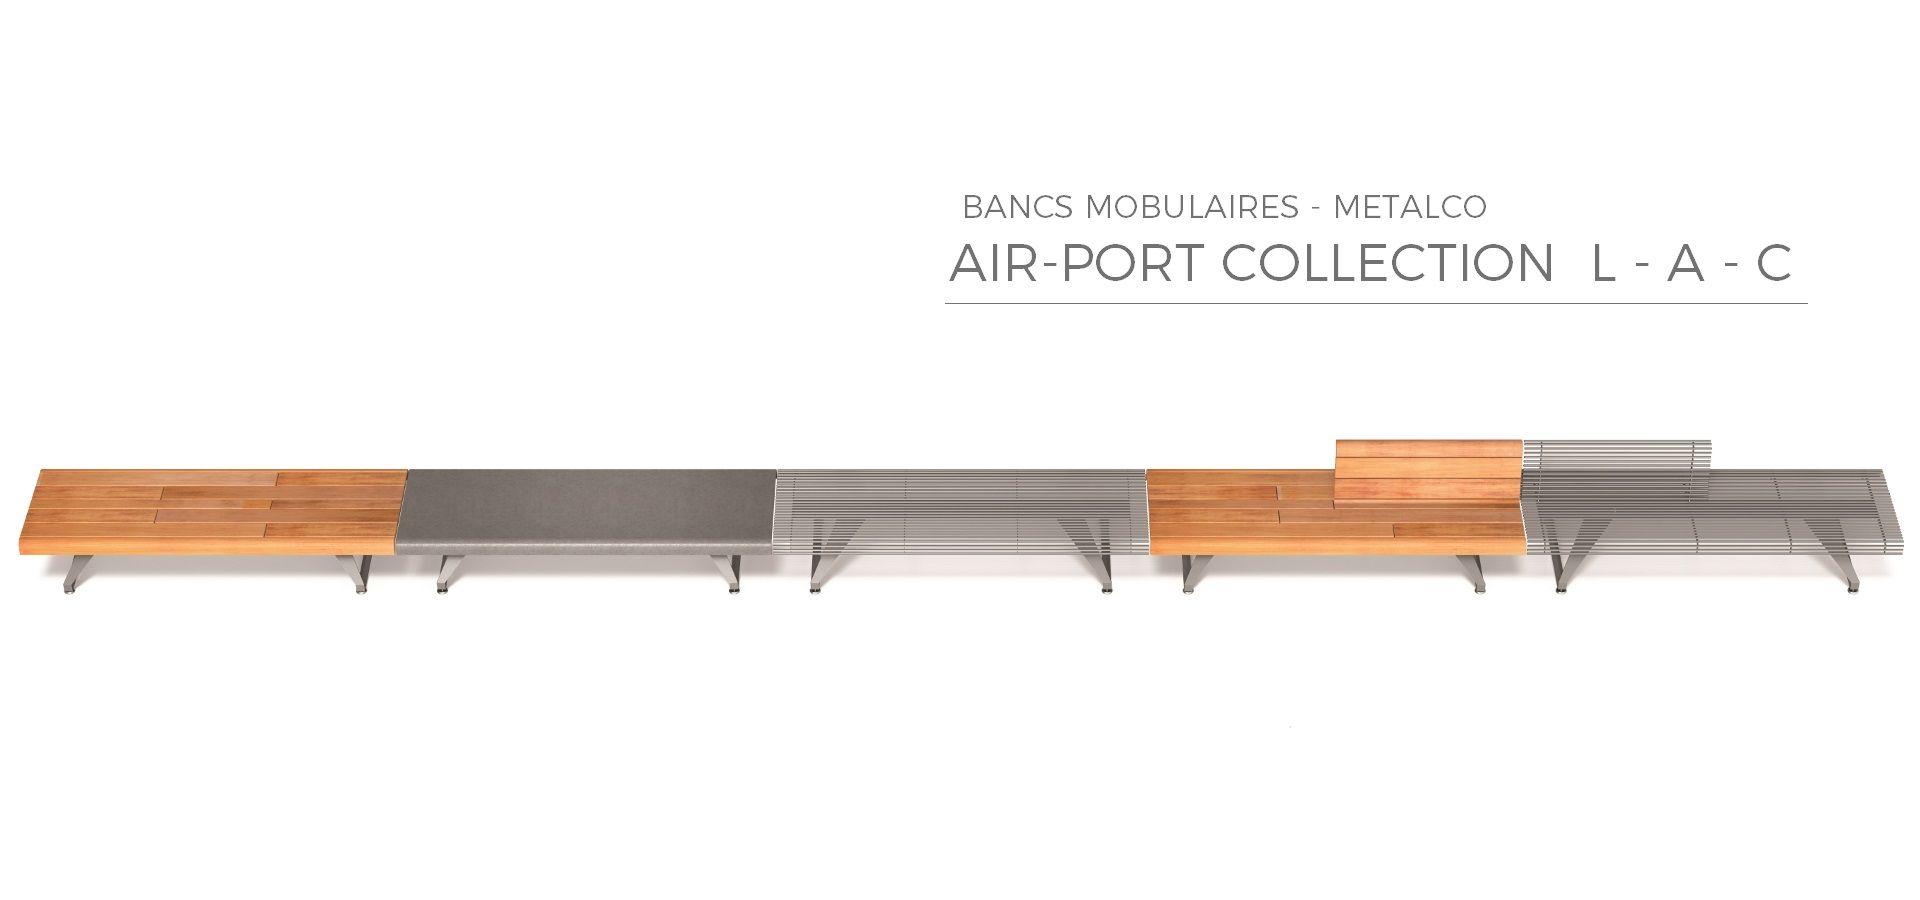 AIR PORT A - Banc Urbain Modulaire, Banc Urbain Design Acier METALCO